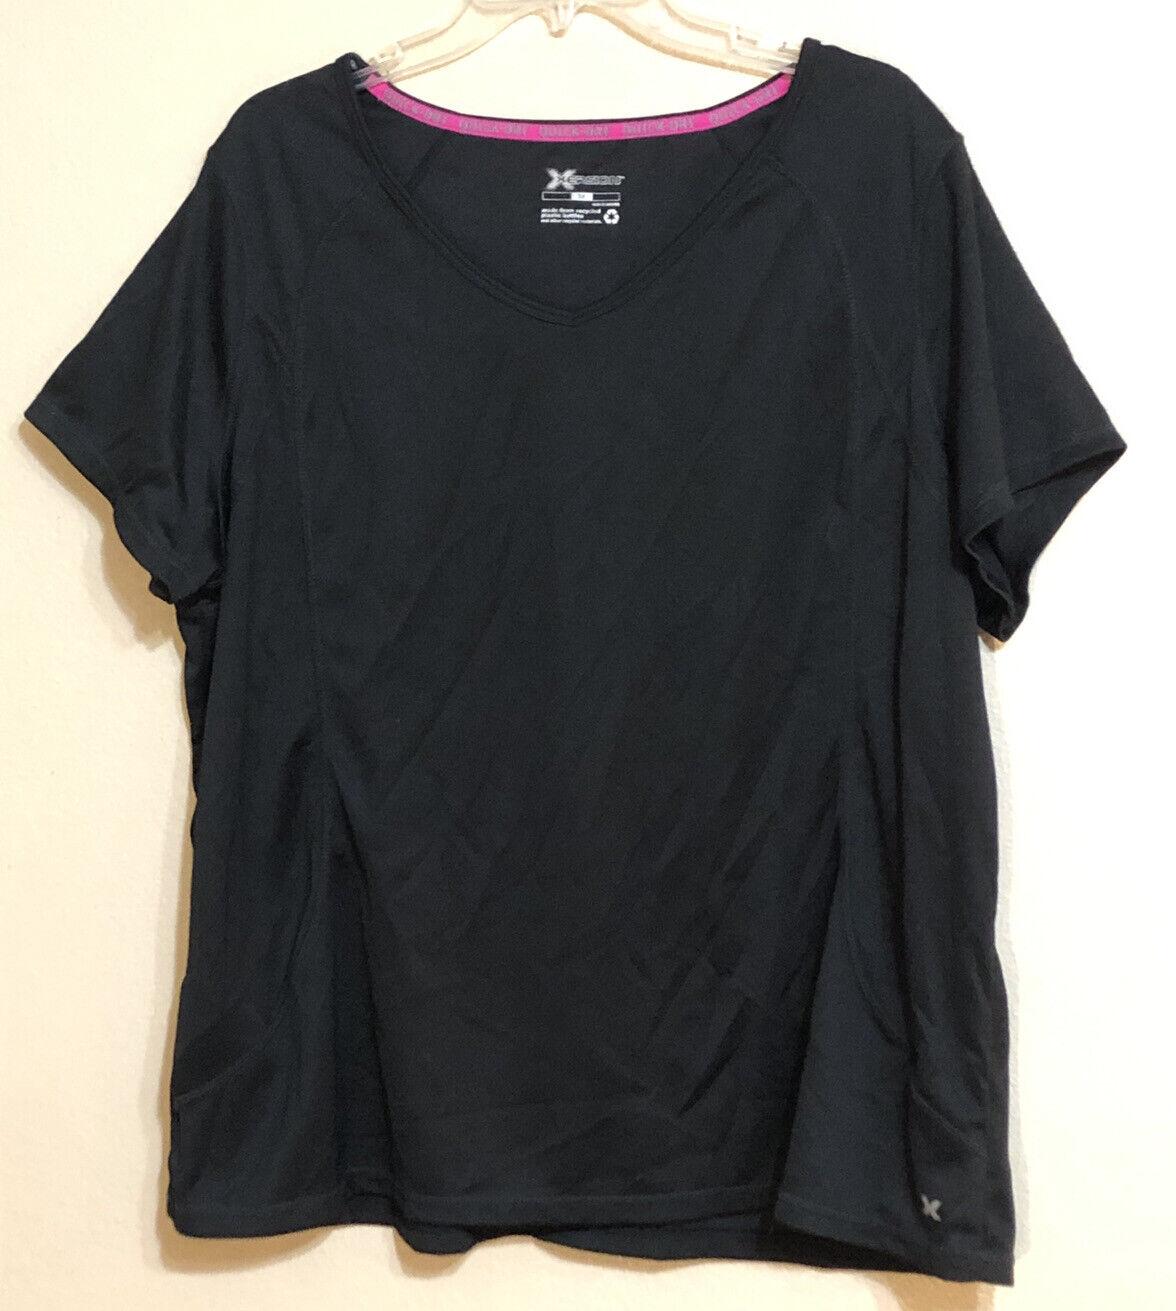 Xersion Womens 3X Black Quick Dri Plus V-neck Short Sleeve Activewear Top